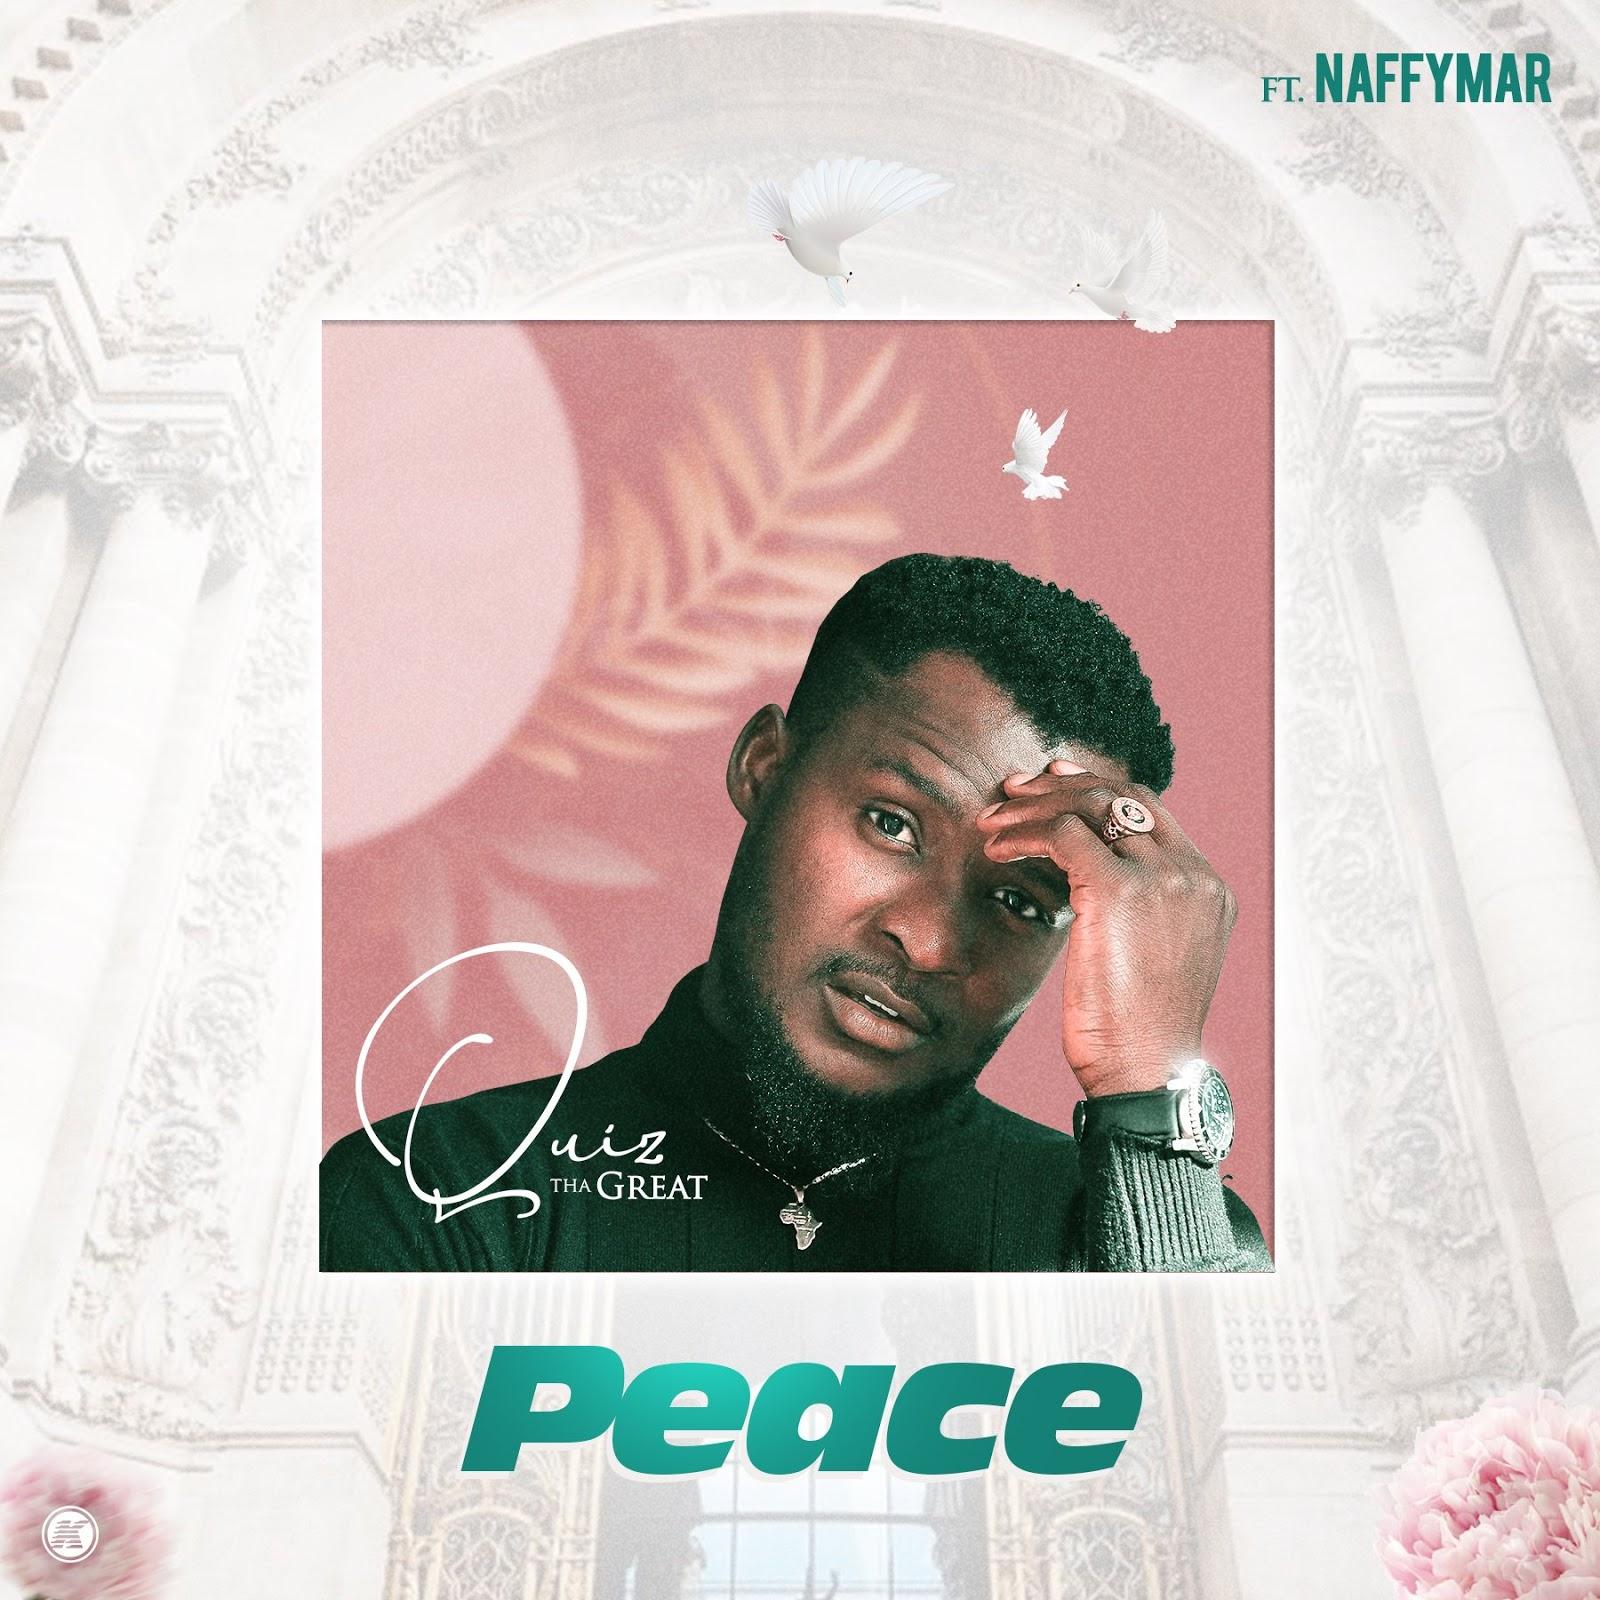 Quiz Tha Great ft. Naffymar - Peace Mp3 Download